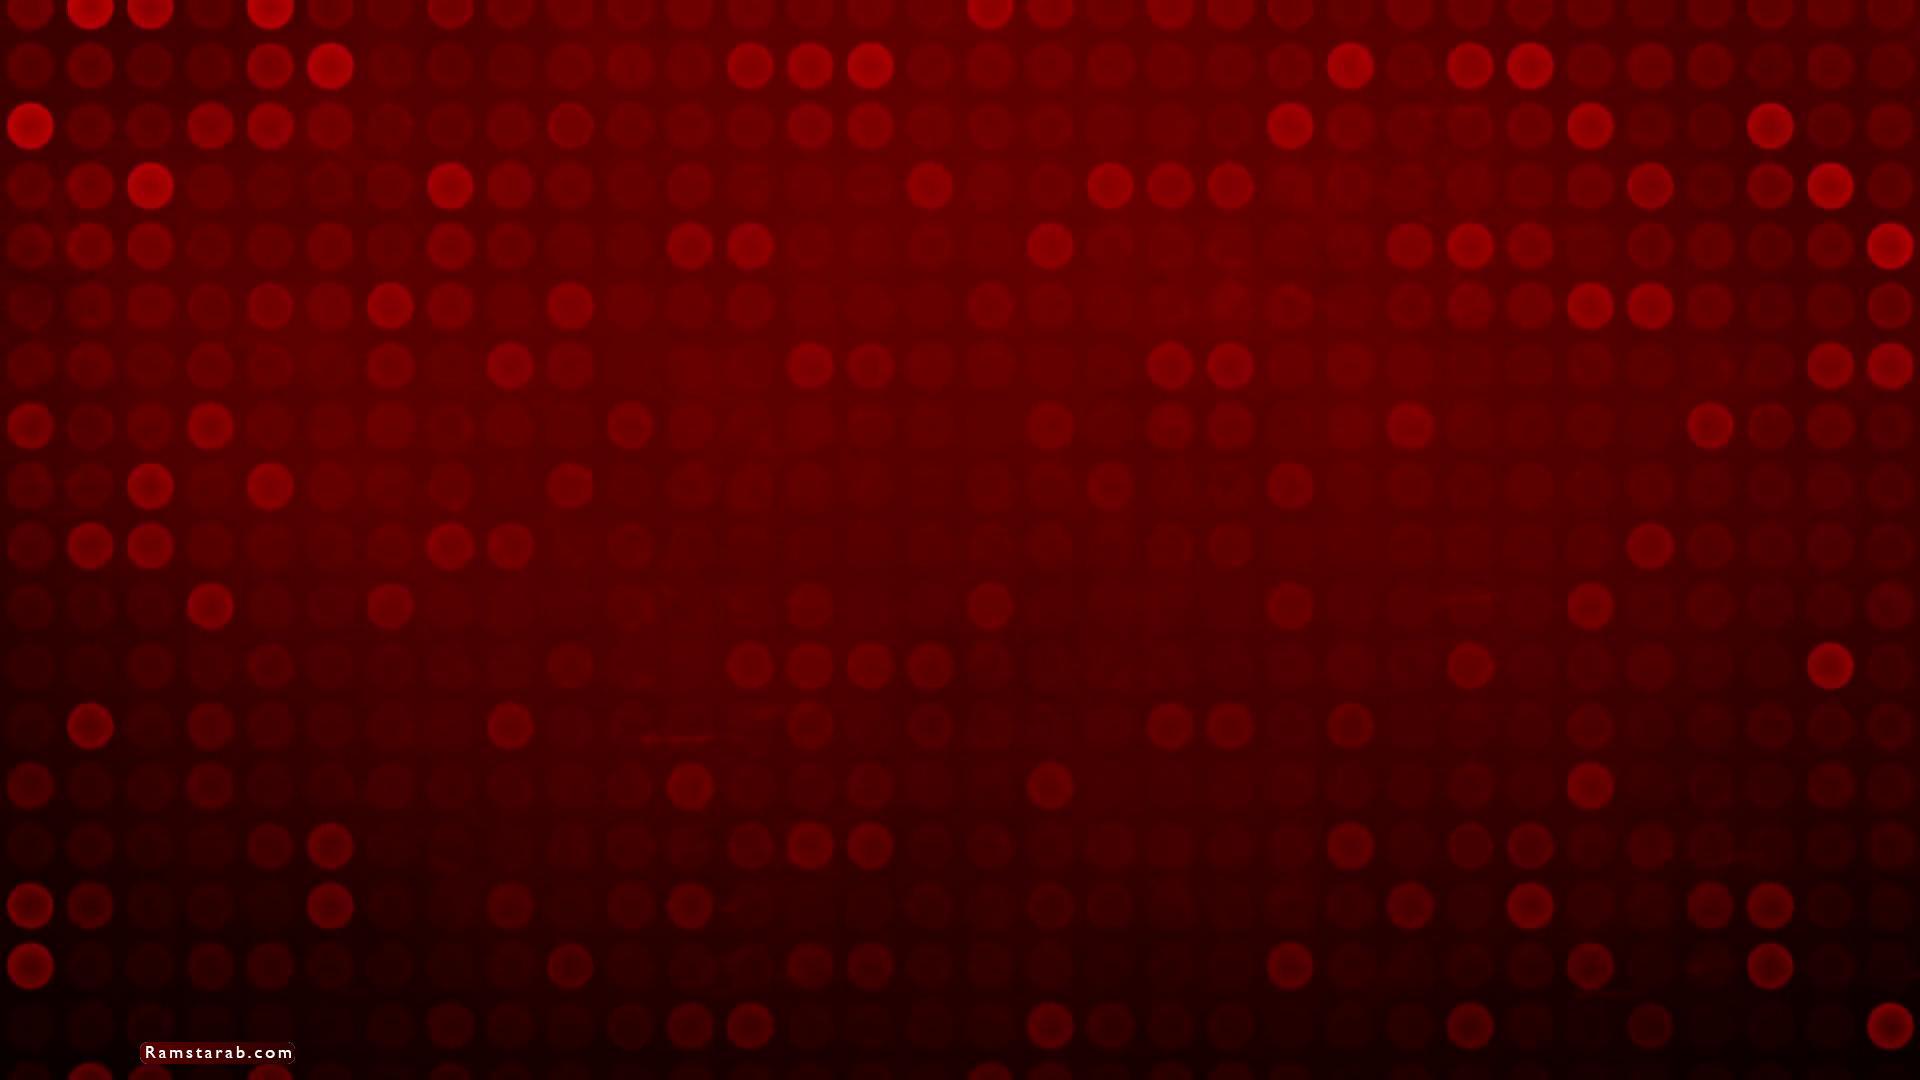 خلفيات حمراء5